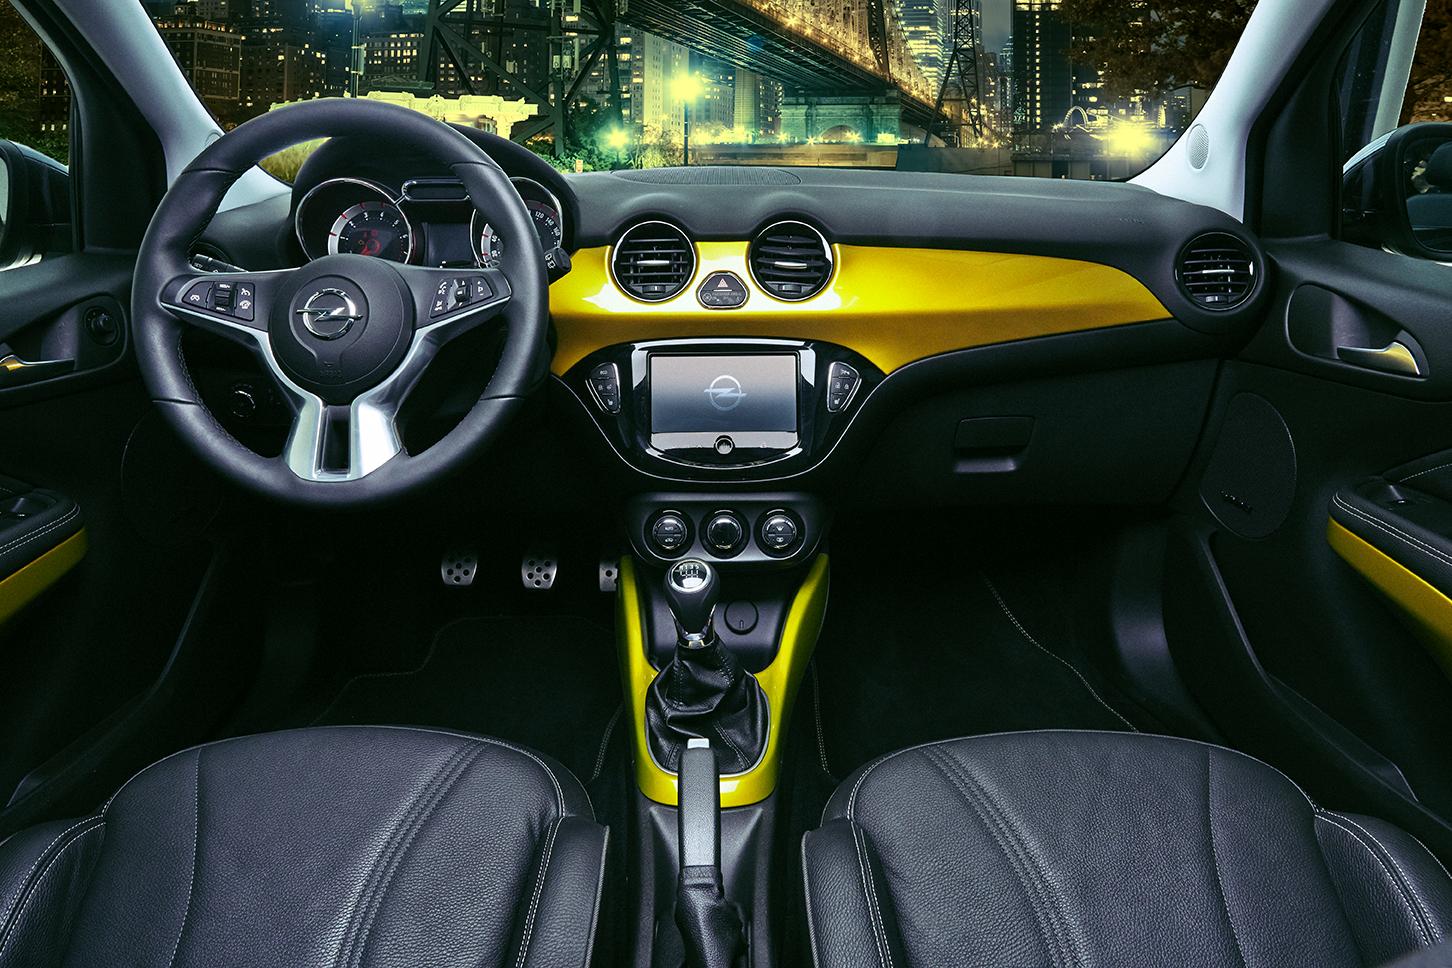 Opel_Adam_GQ_2014_5.png